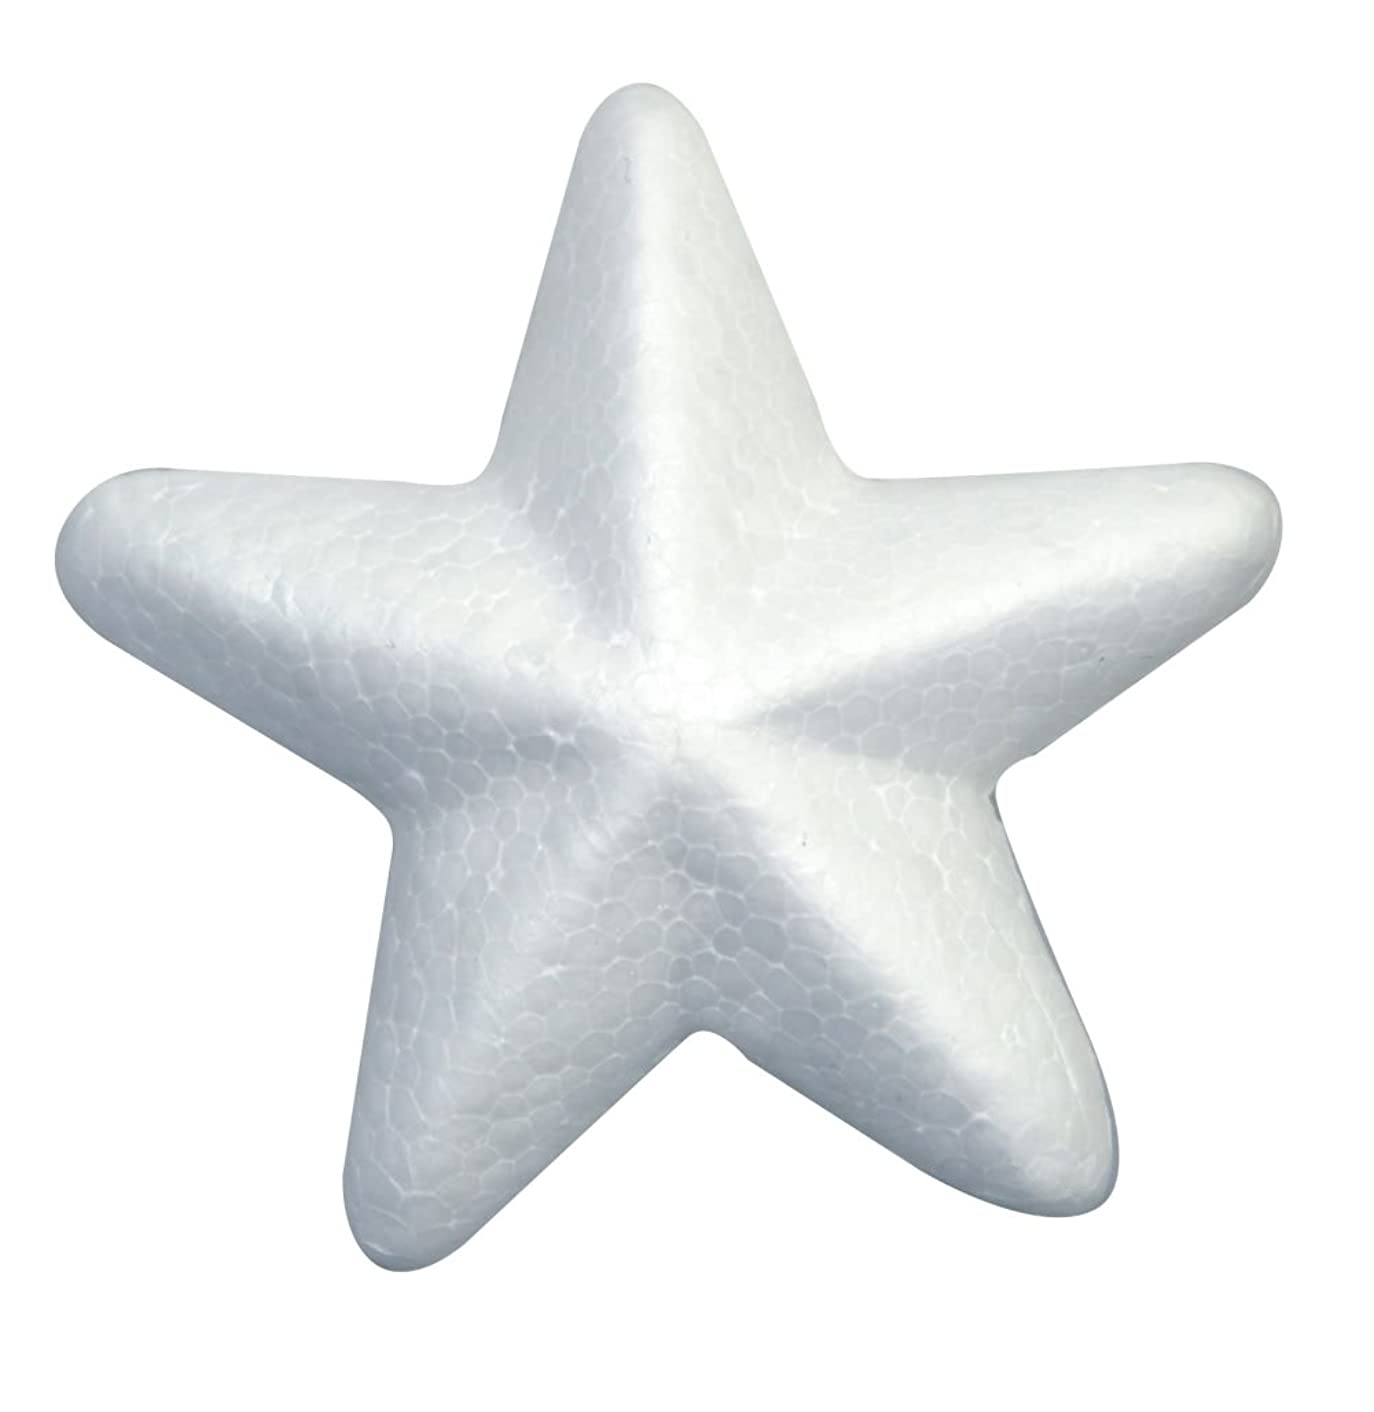 CRAZY CAJUN. Playbox 70mm Foam Stars (25 Pieces)